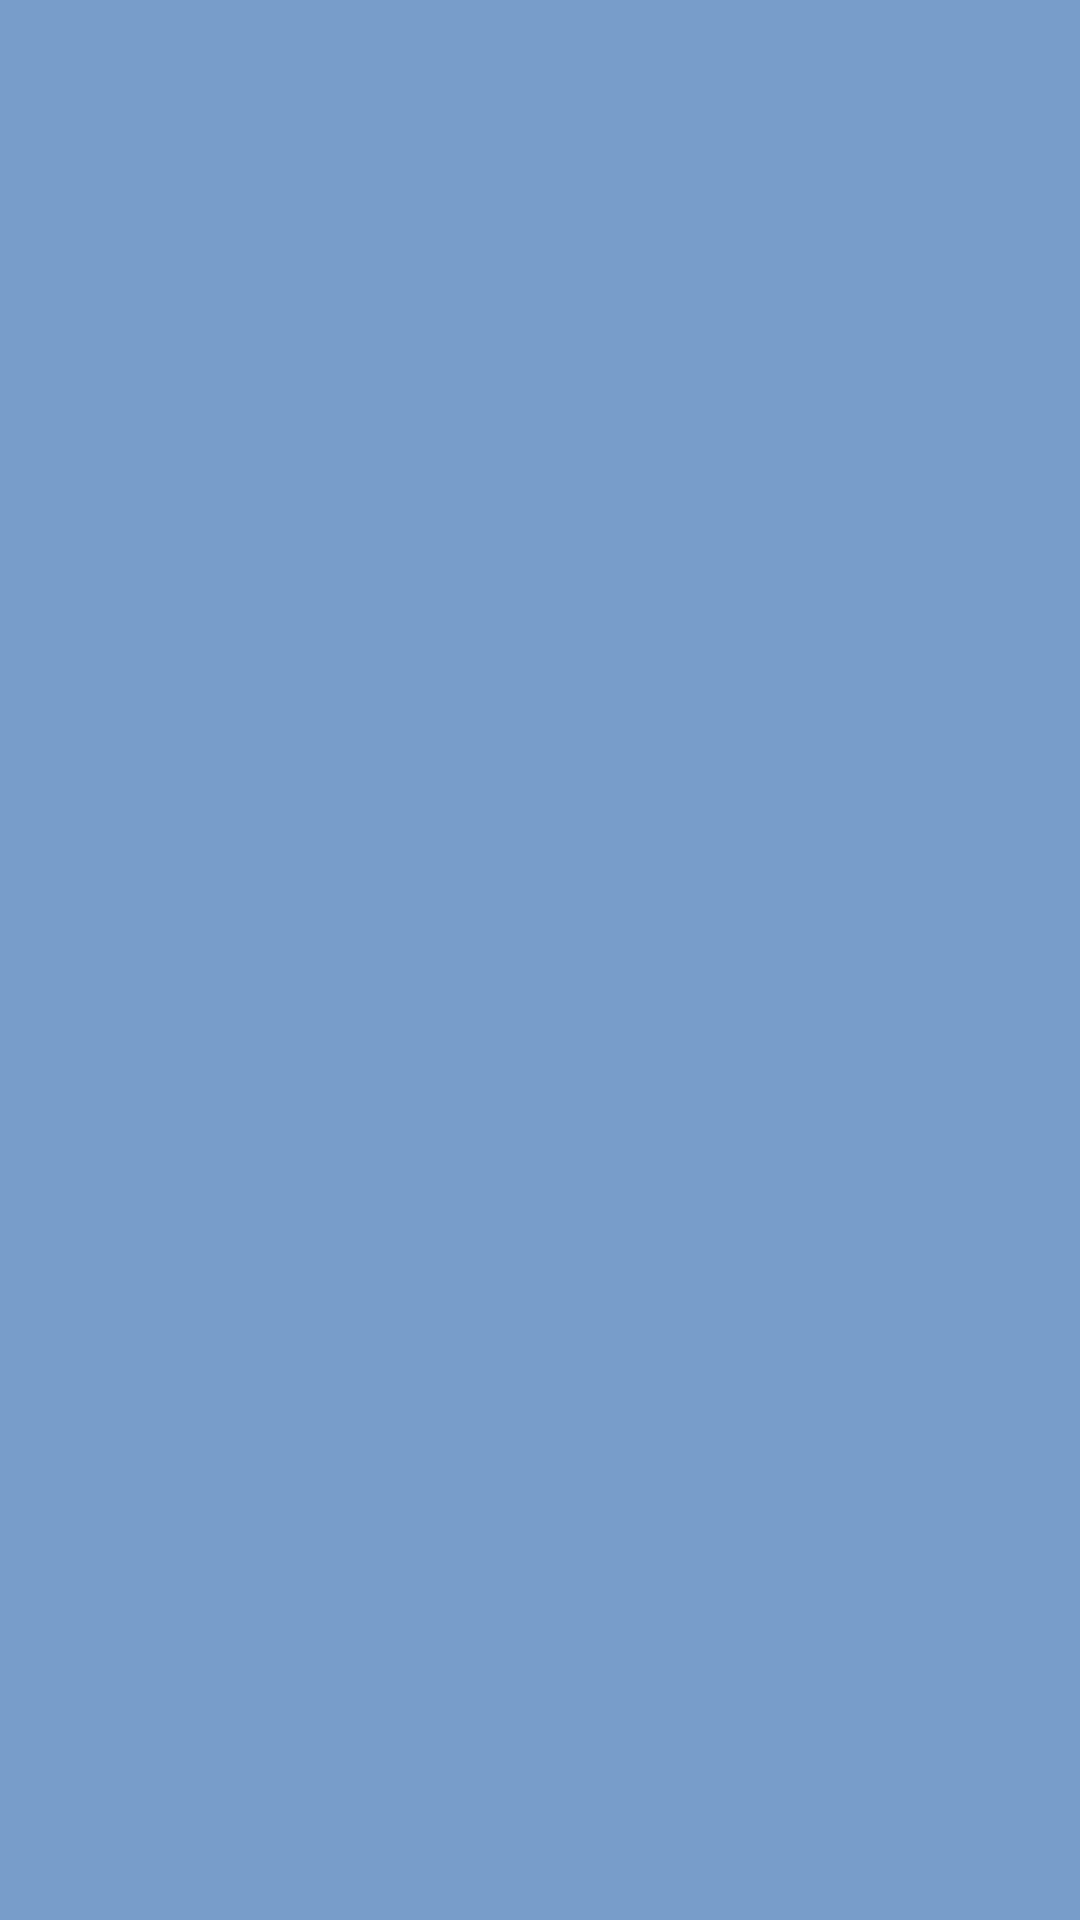 1080x1920 Dark Pastel Blue Solid Color Background